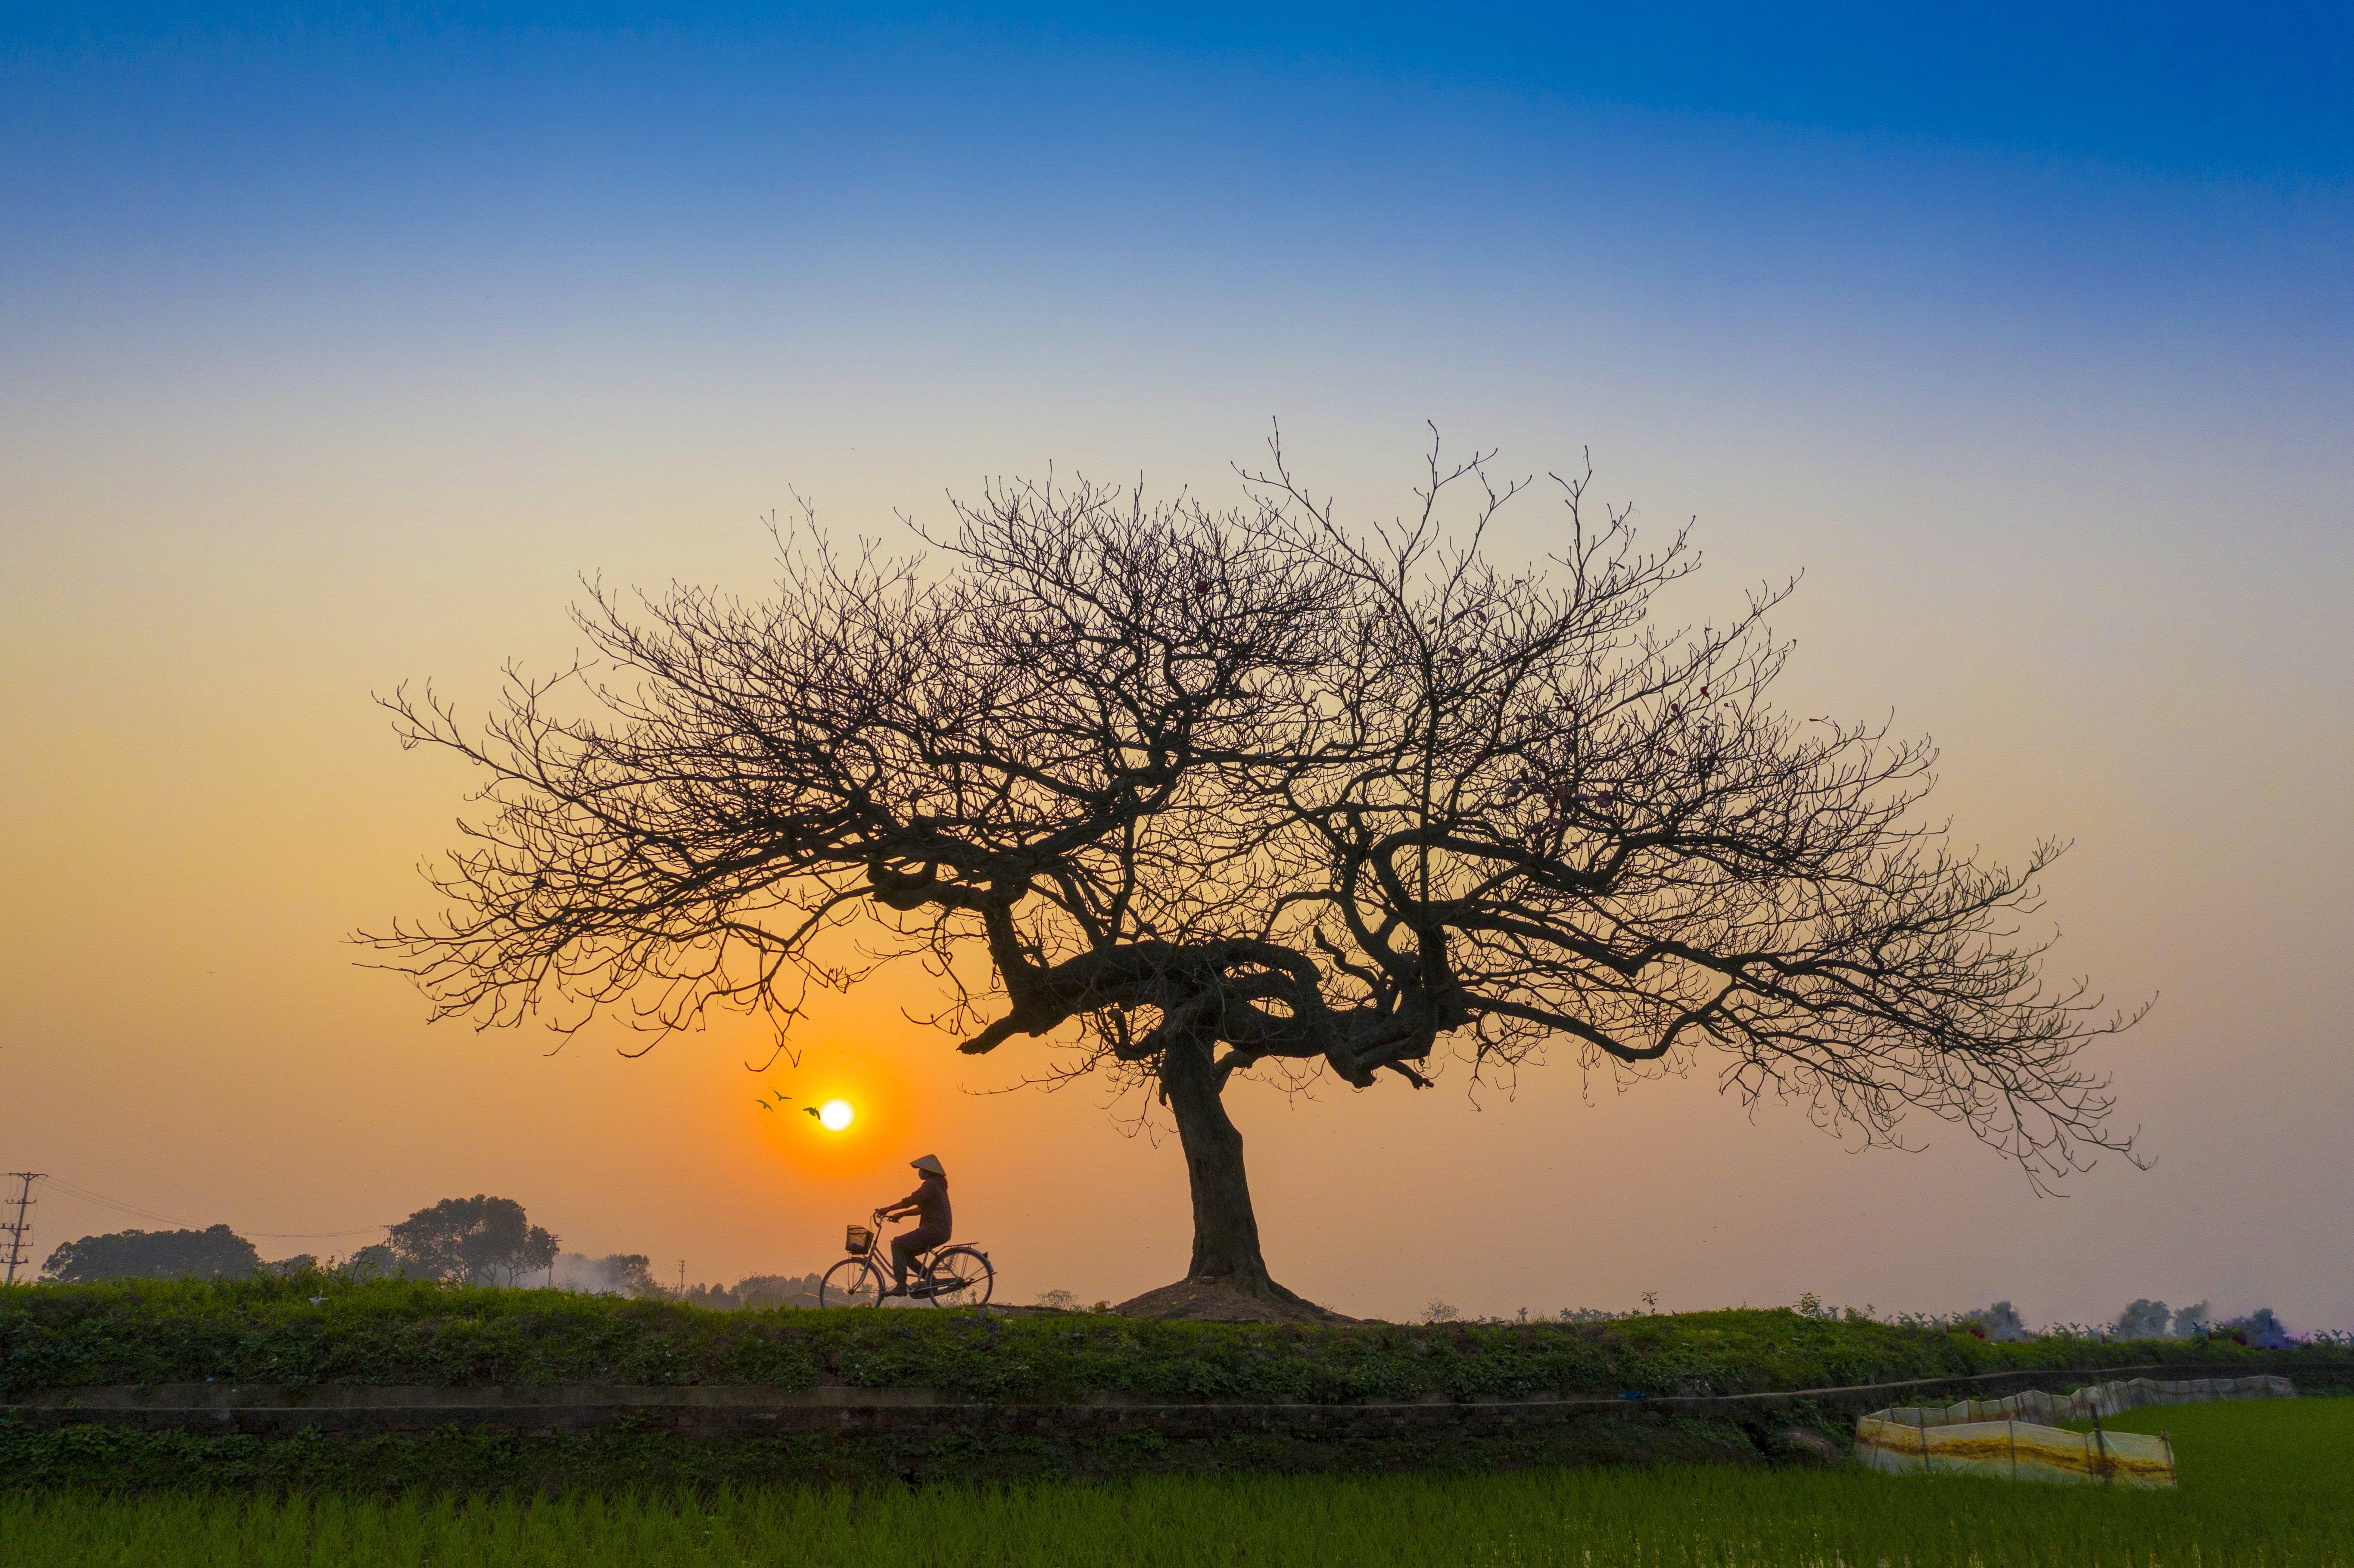 Color Palette – sunset afternoon bicycle lonely –  #b09d89, #203f45, #976a2f, #503c28, #597aa3 – Easily Suede color, Bay Isle Pointe color, Woodgrain color, Bonanza color, Montreux Blue color